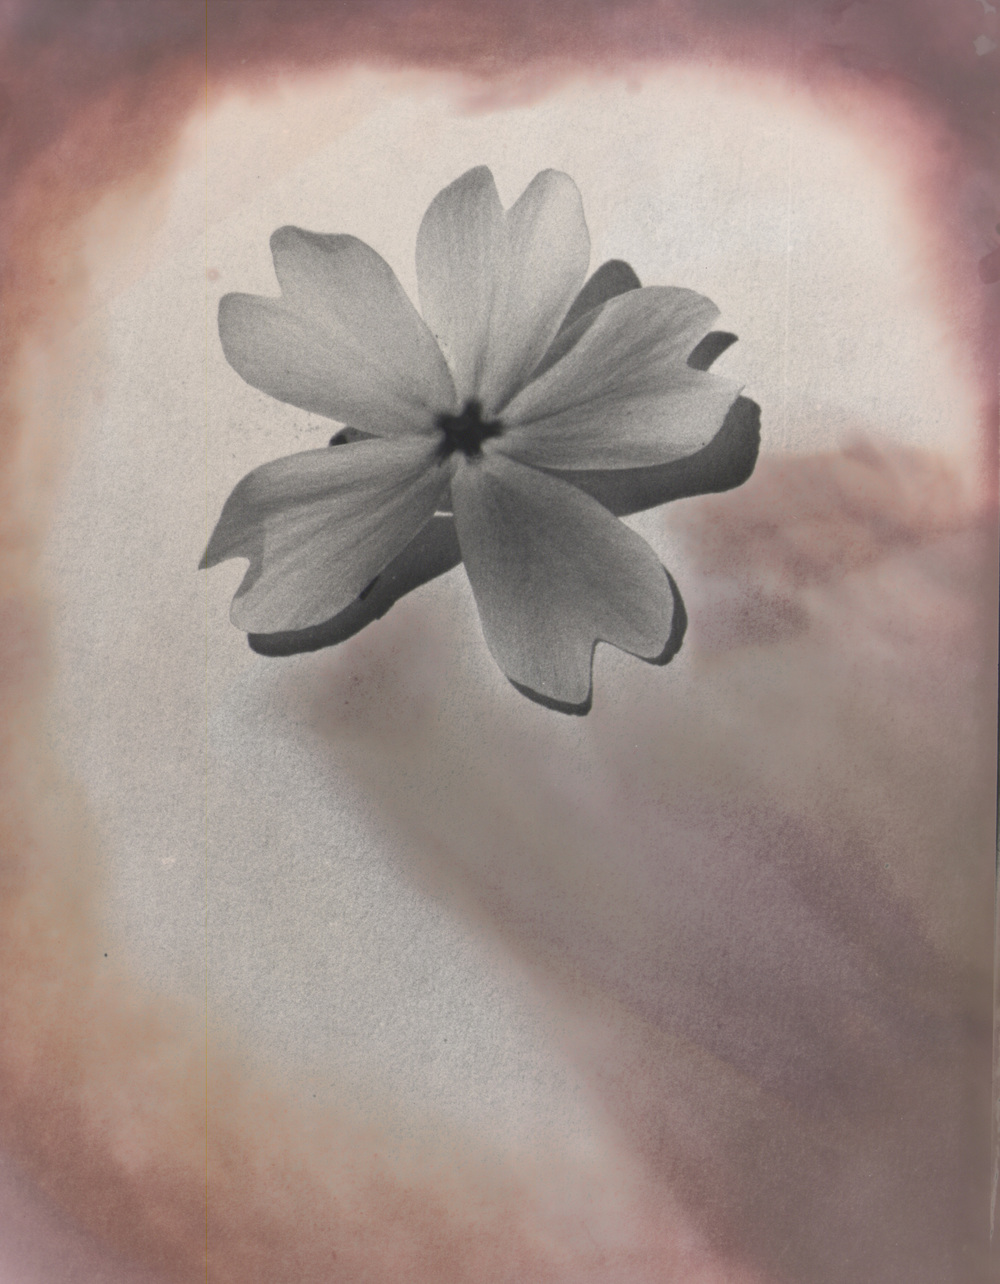 Flower Chromoskedasic